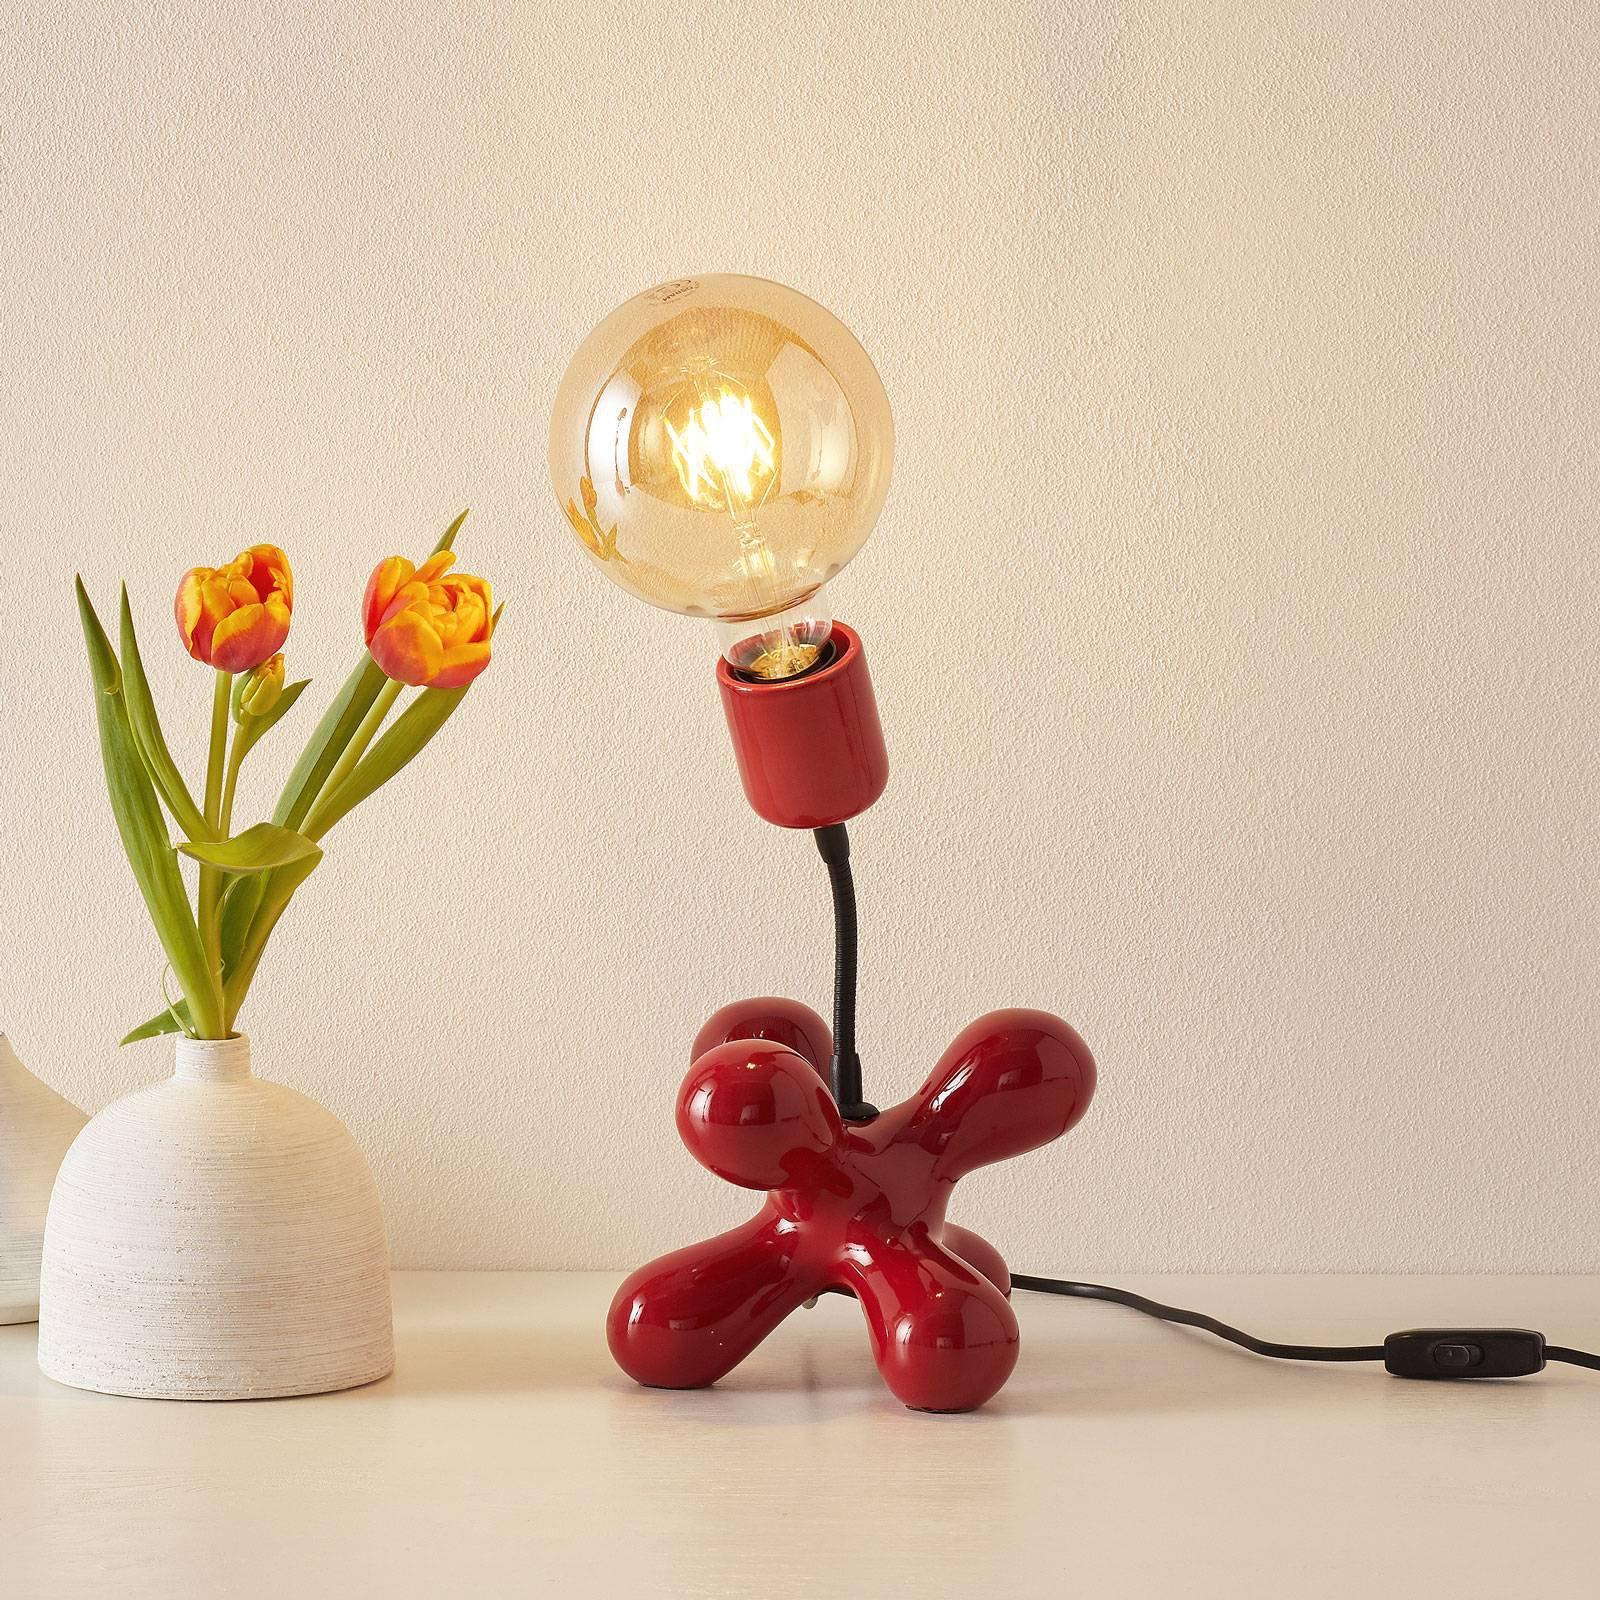 Keramisk bordlampe L181 med fleksarm, rød blank